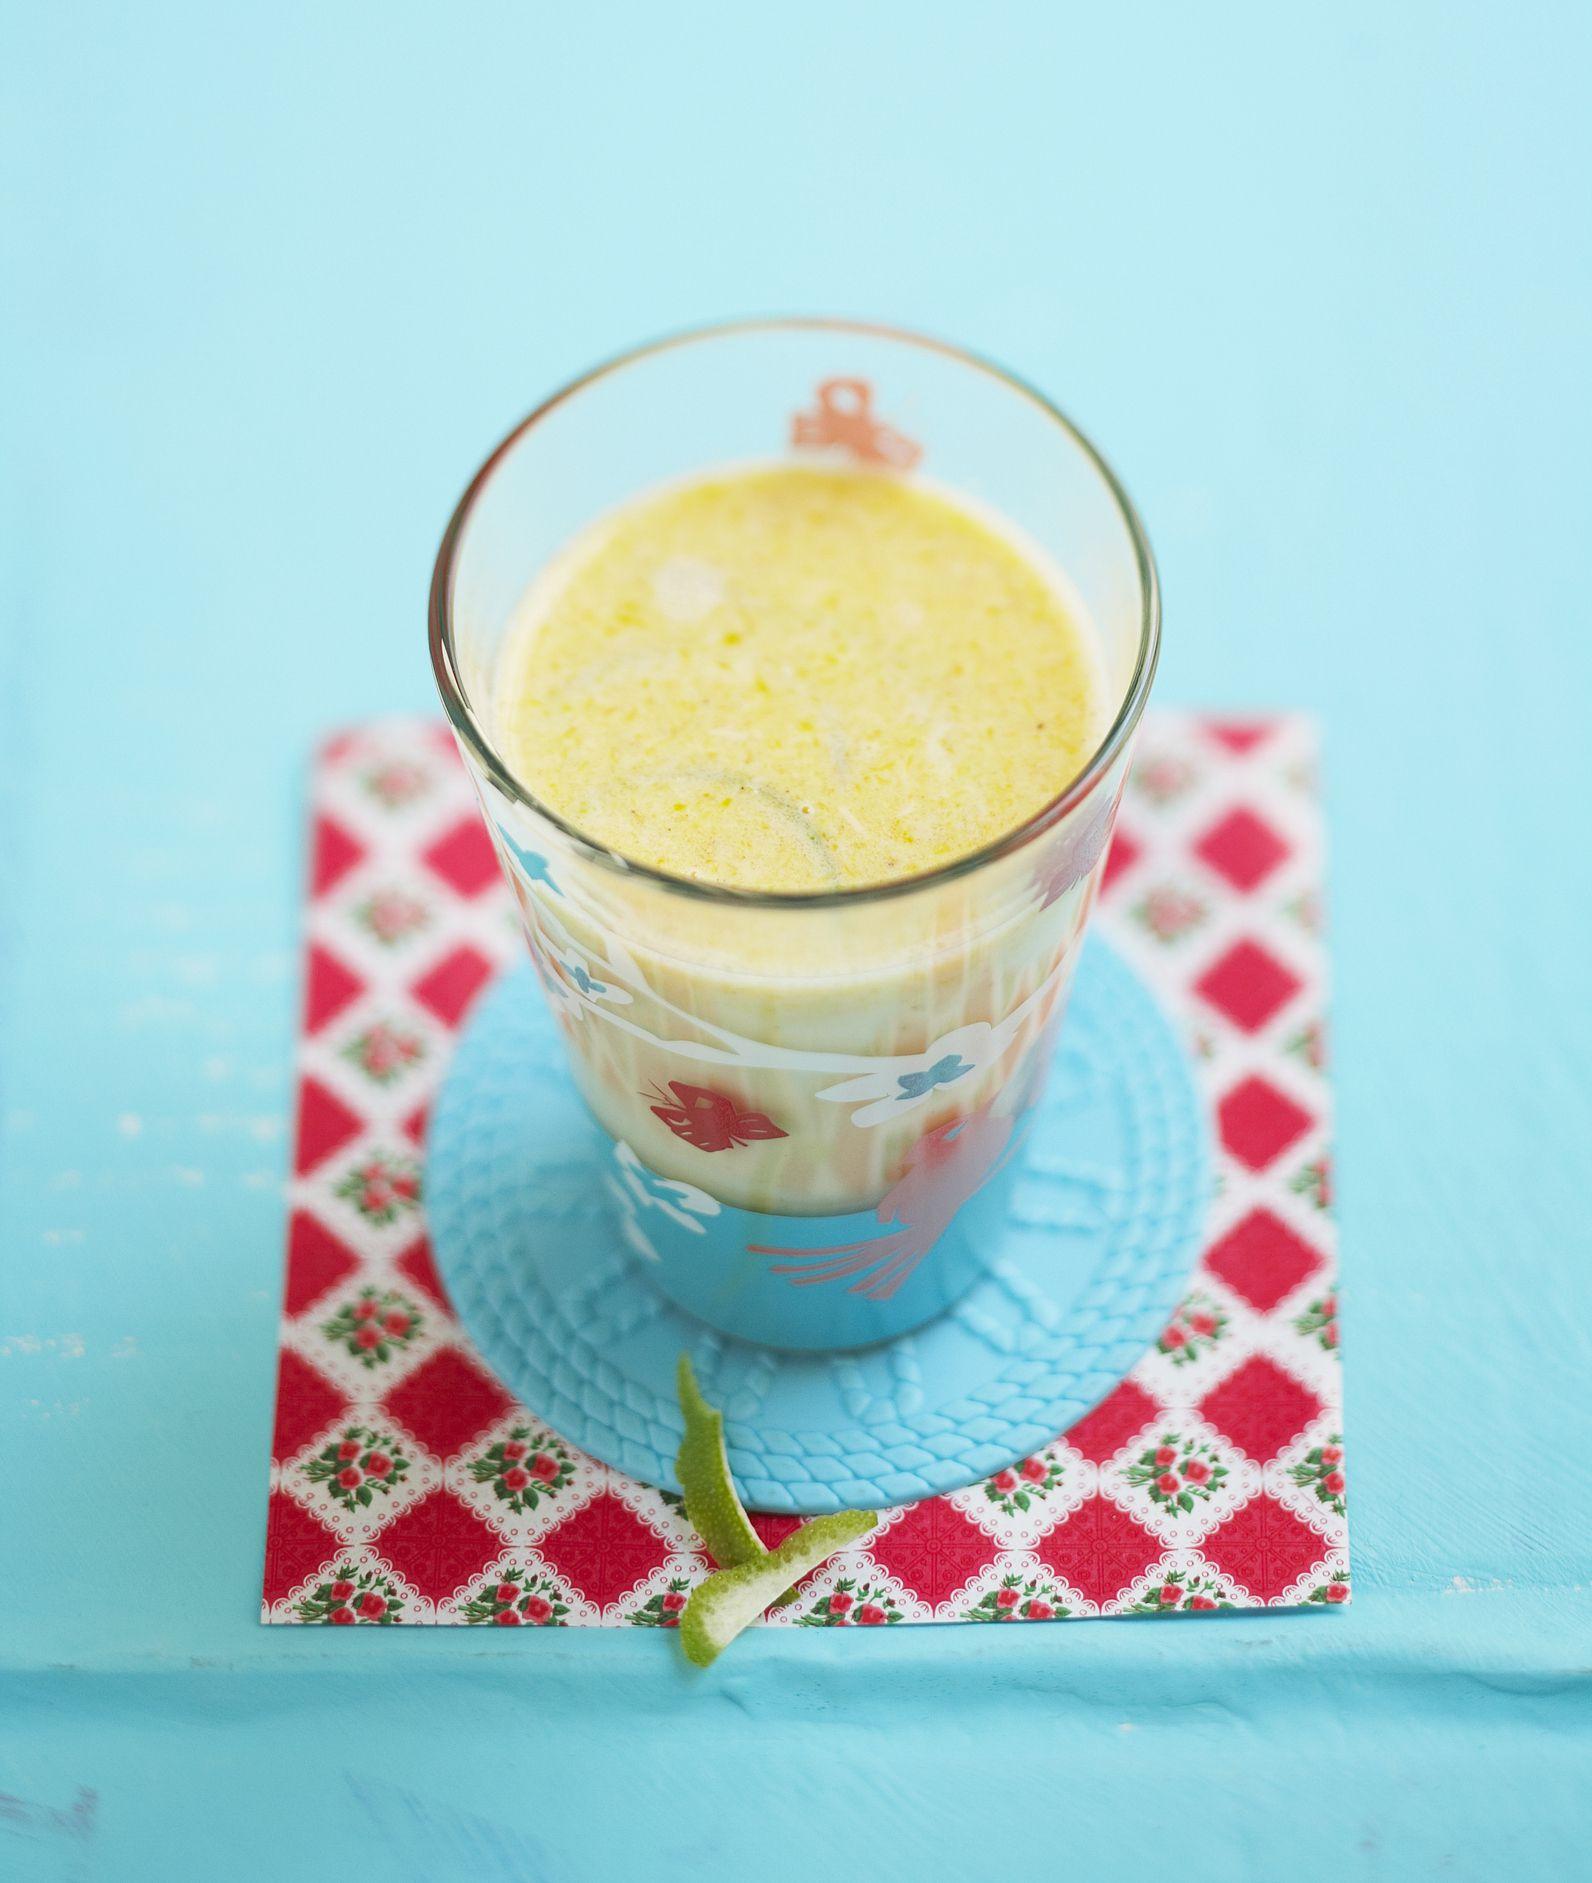 How to Make Punch de Creme or Caribbean Eggnog